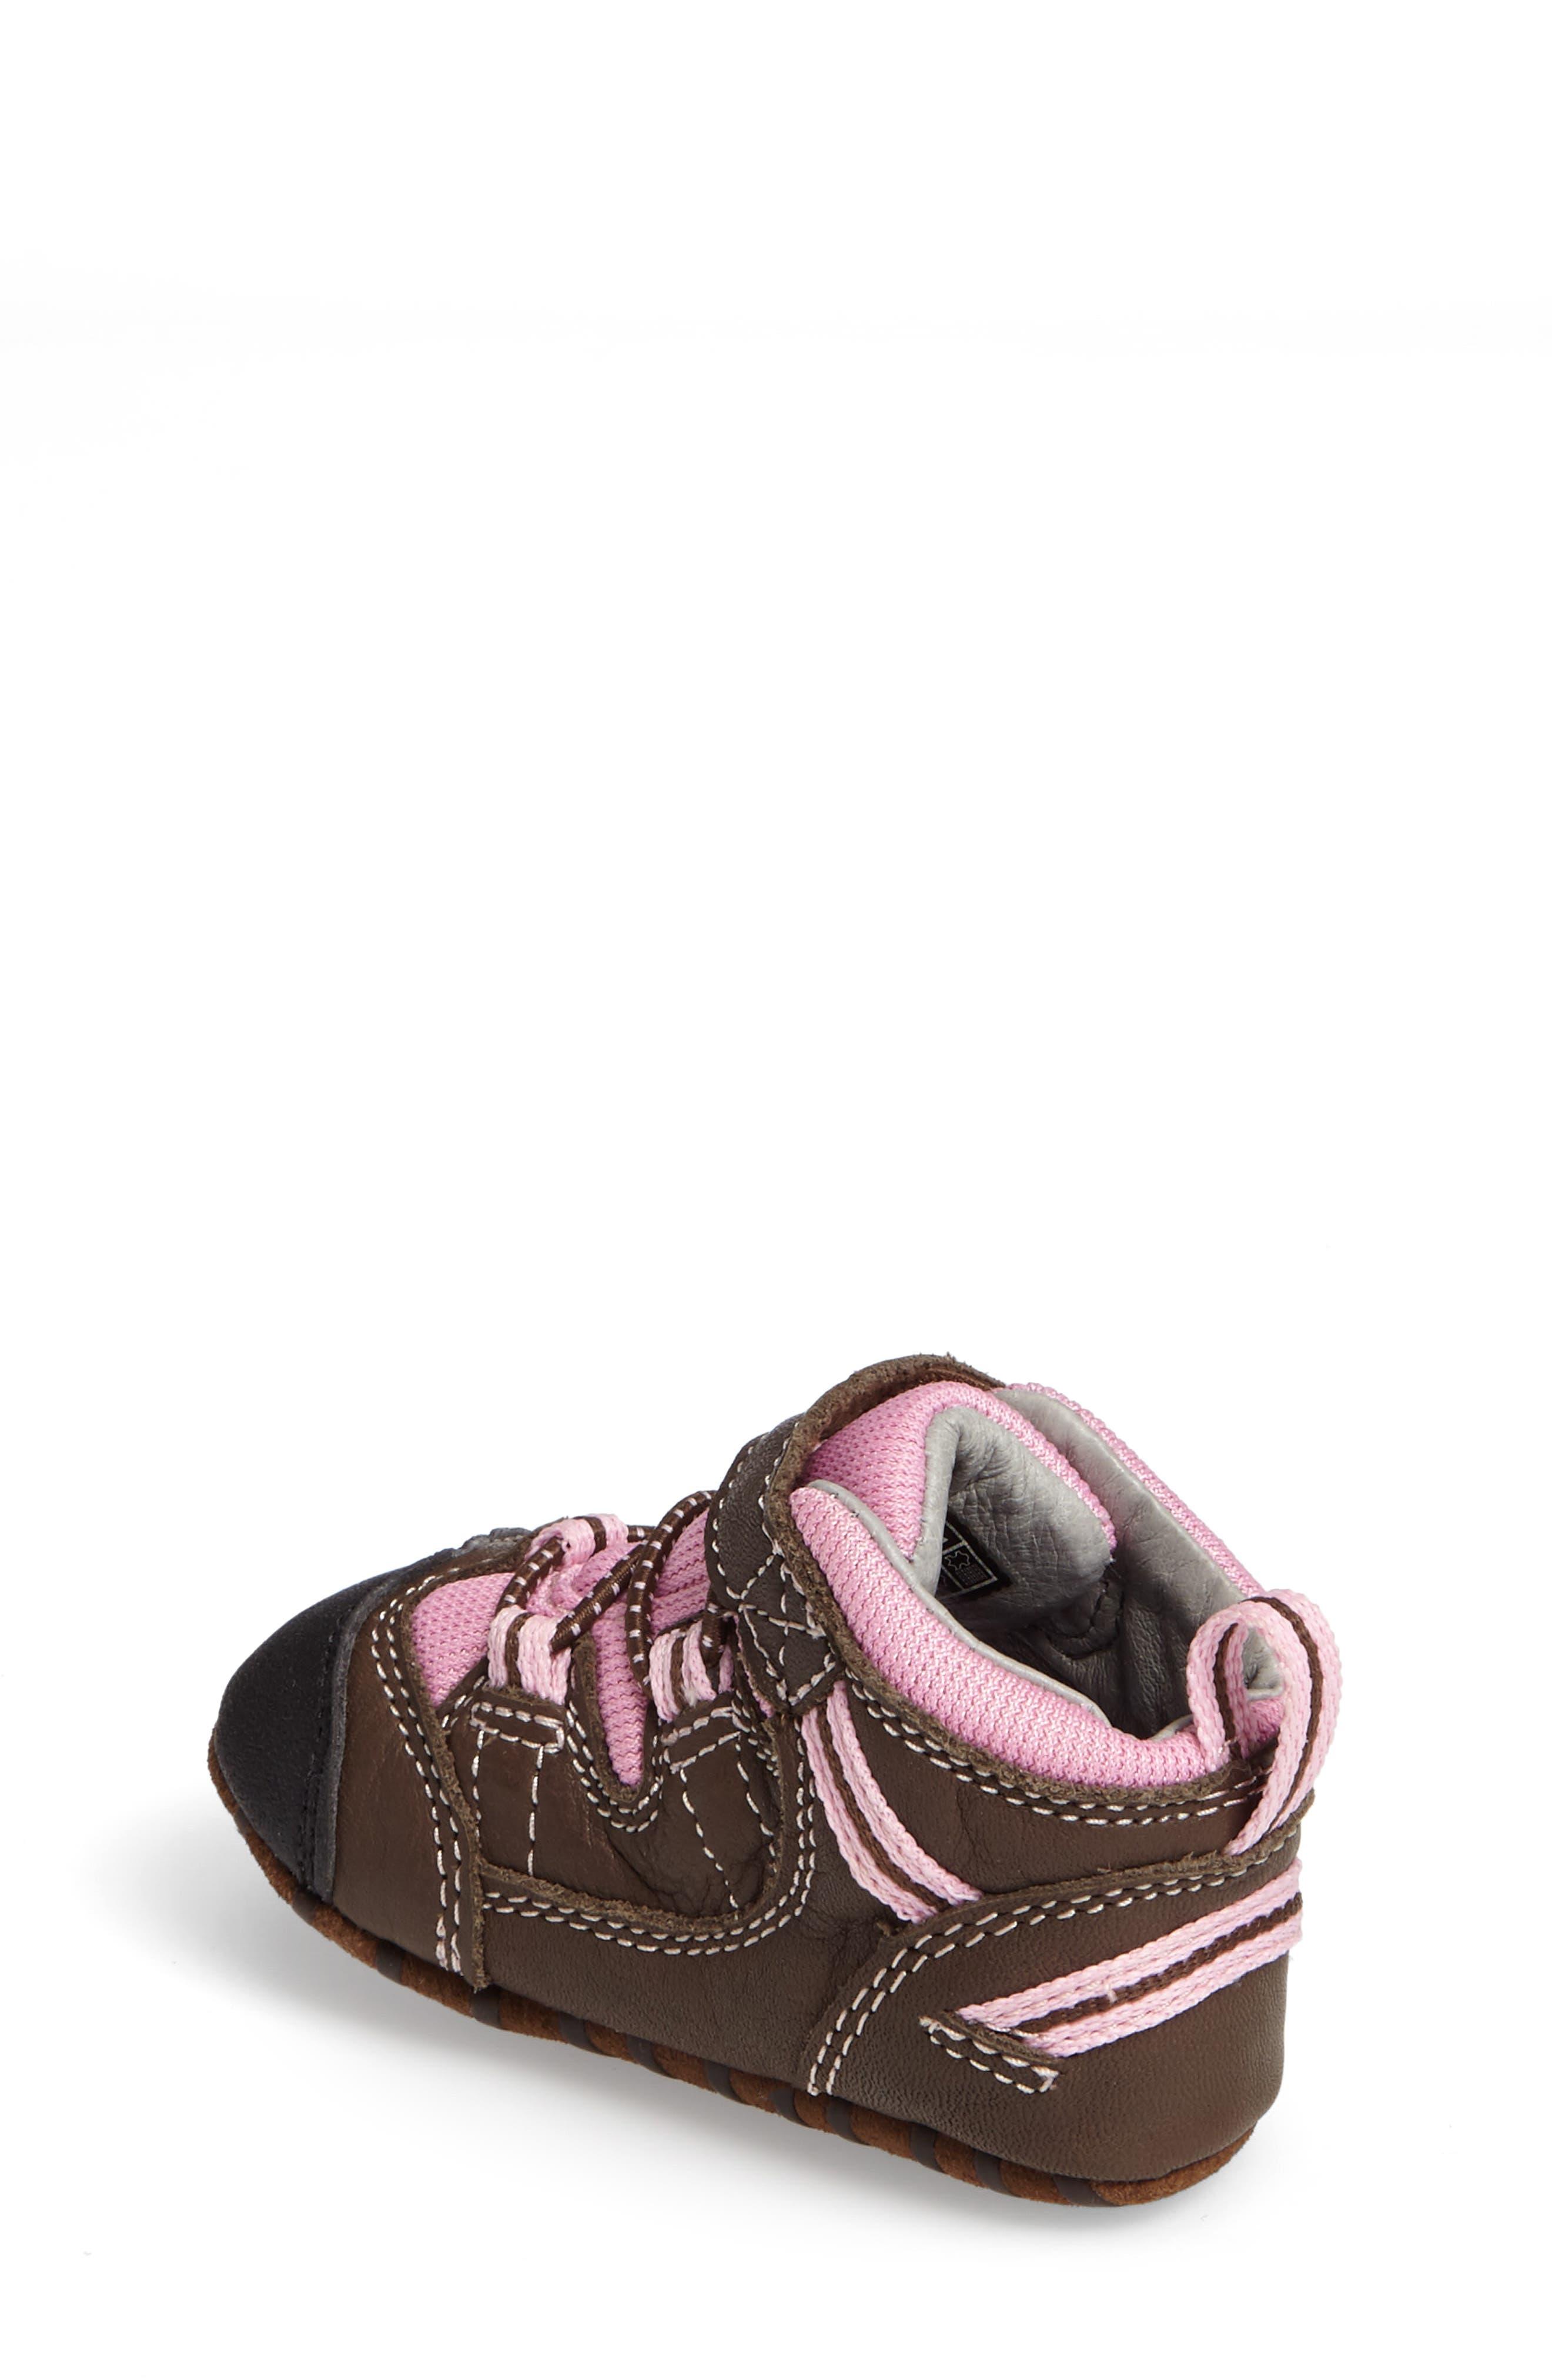 Targhee Crib Shoe,                             Alternate thumbnail 2, color,                             204